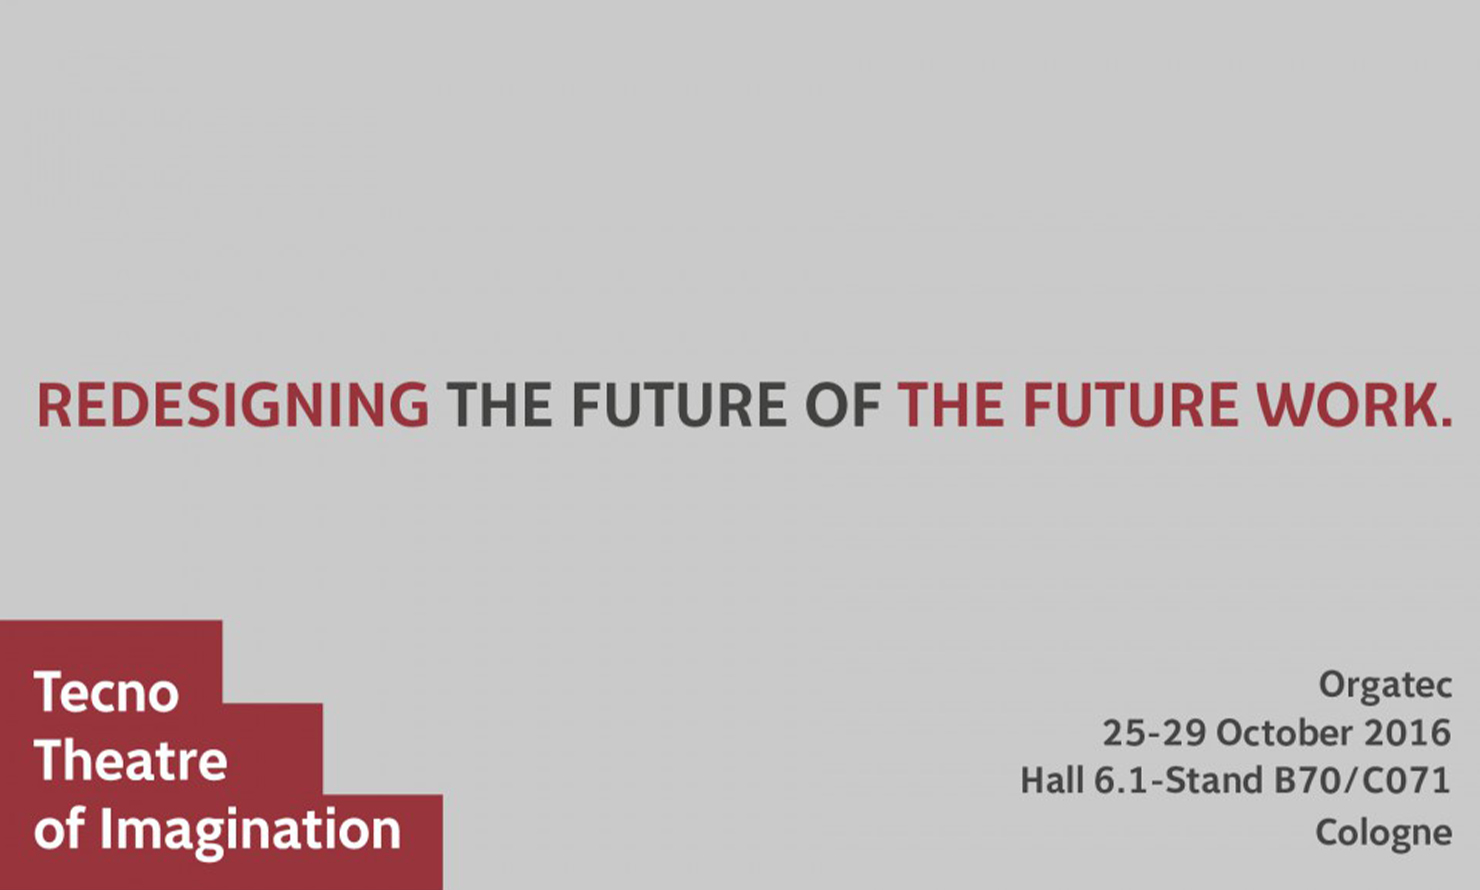 https://www.kubelibre.com/uploads/Slider-work-tutti-clienti/tecno-redesigning-the-future-of-the-future-of-work-3.jpg